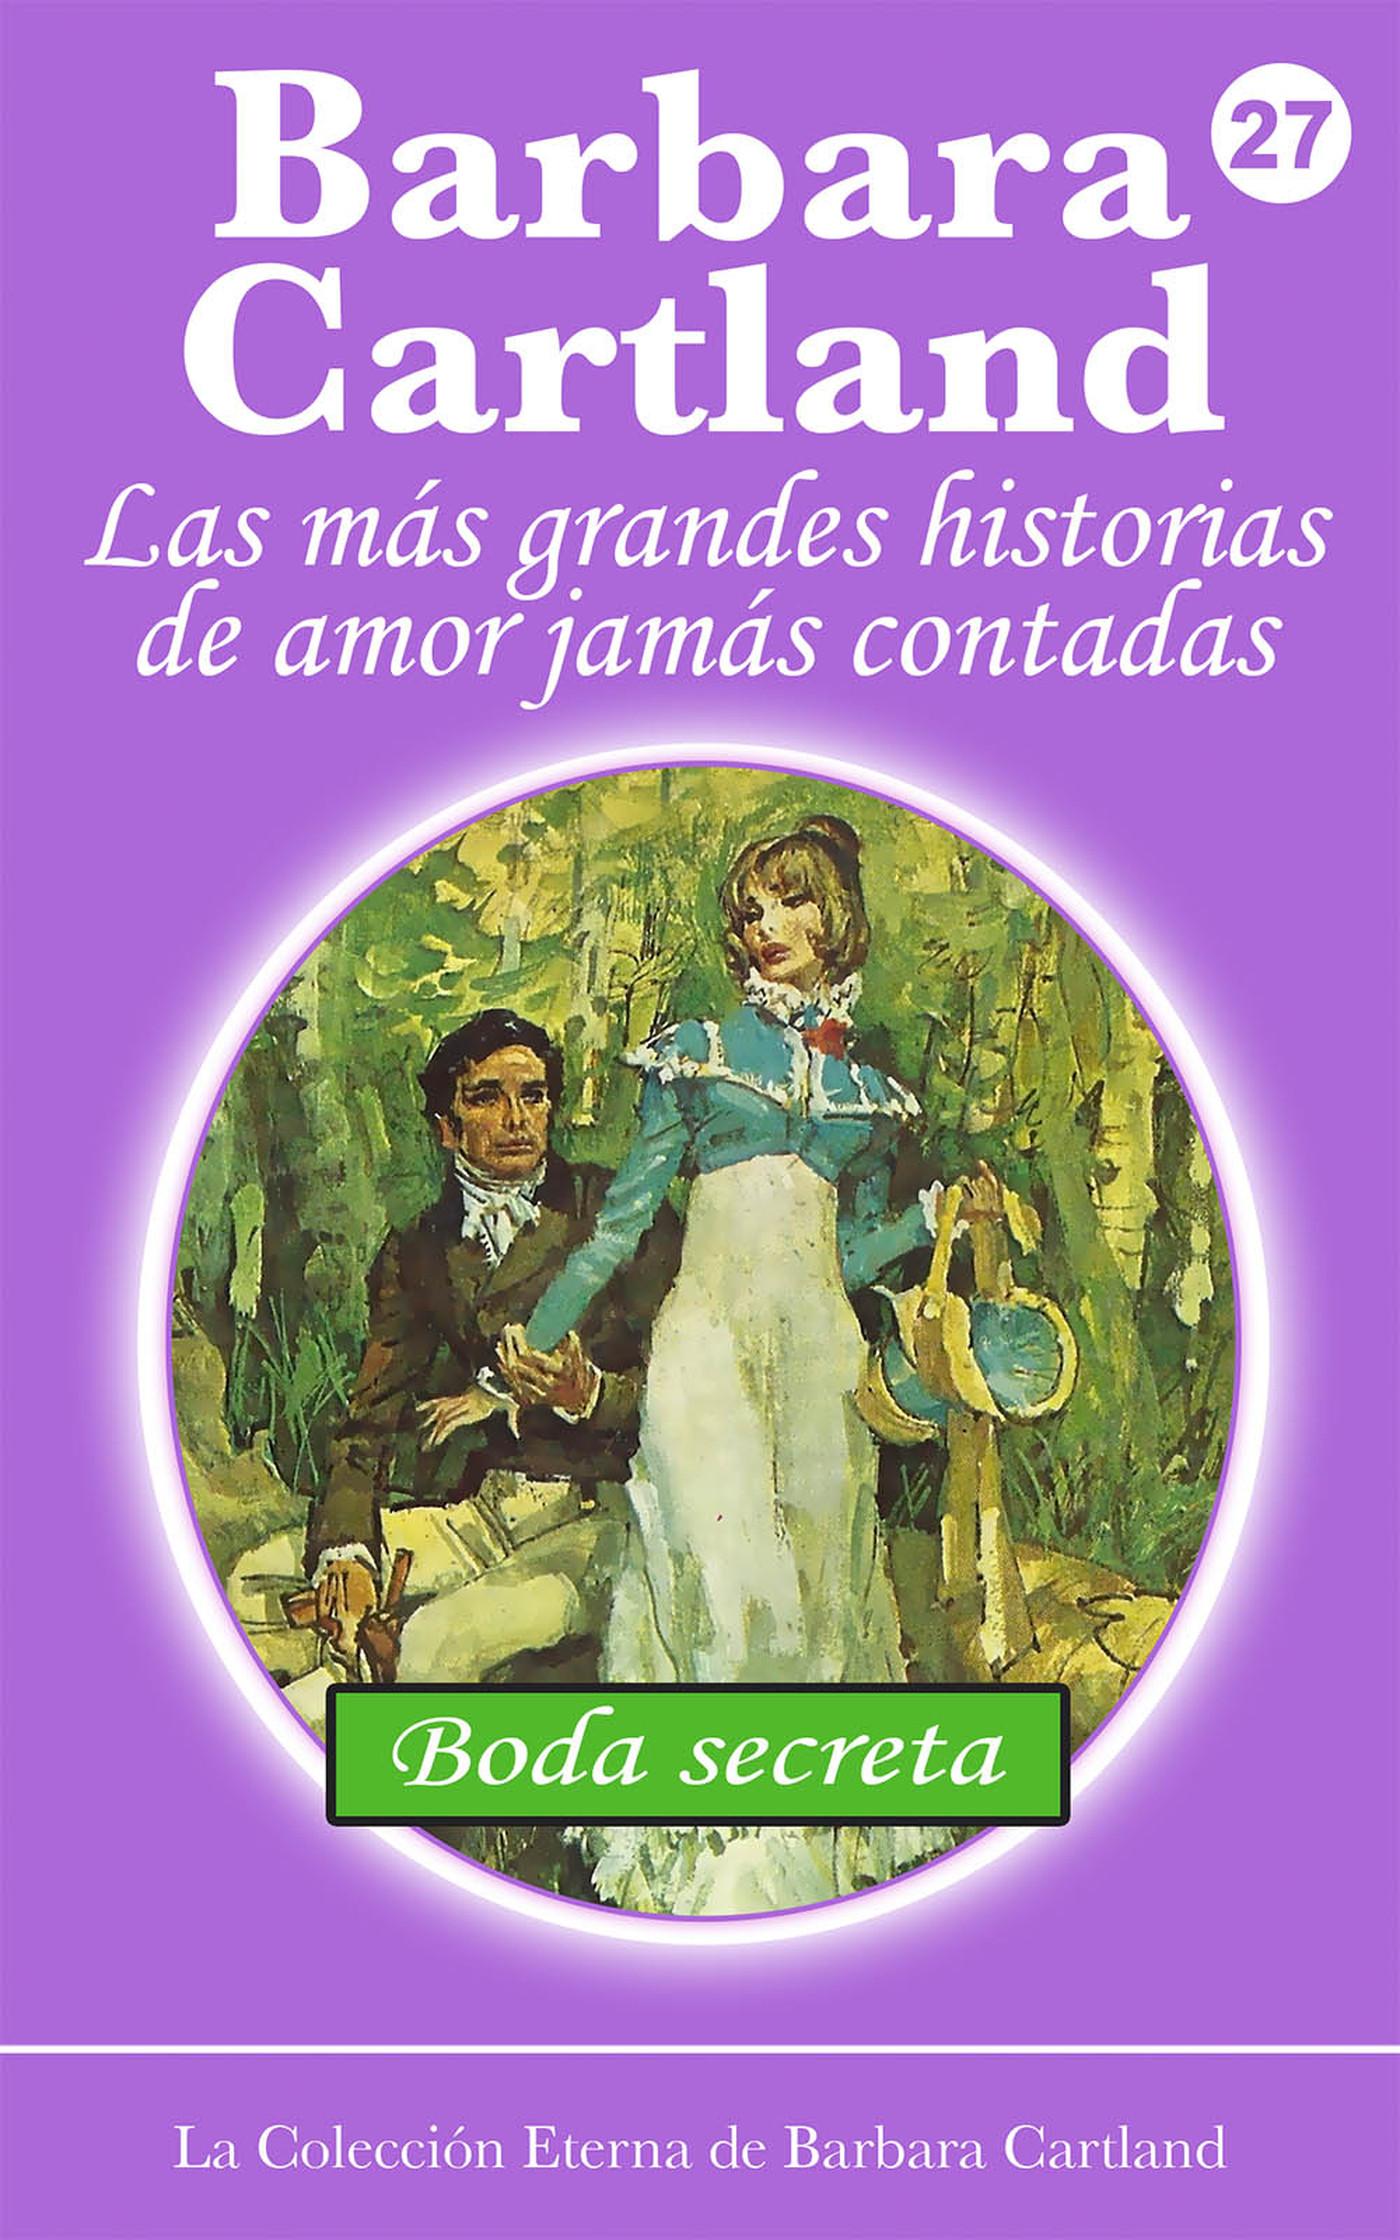 Barbara Cartland Boda Secreta cartland barbara keelatud armastus